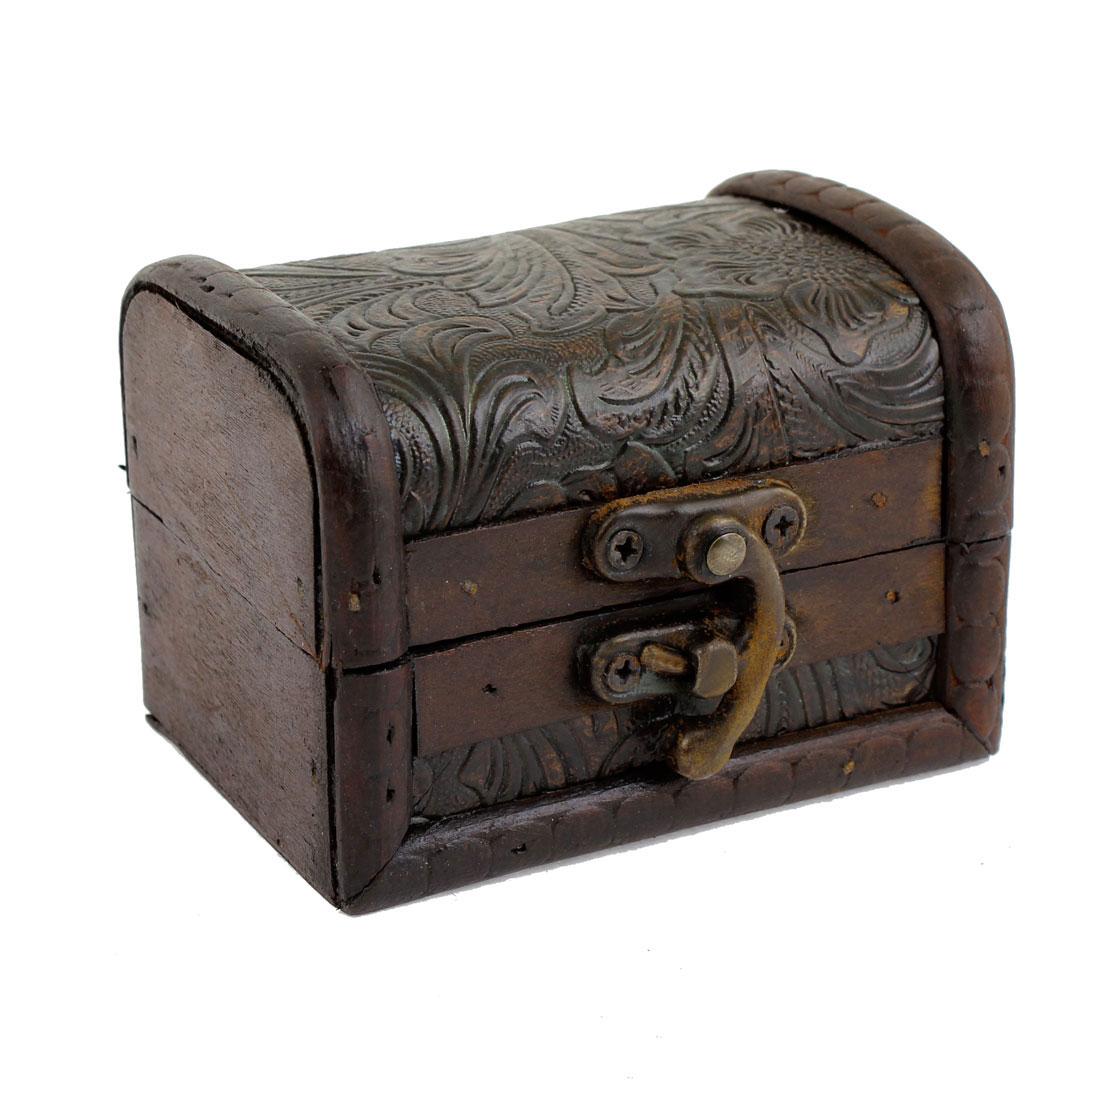 Chrysanthemum Print Wood Metal Buckle Jewelry Storage Case Box